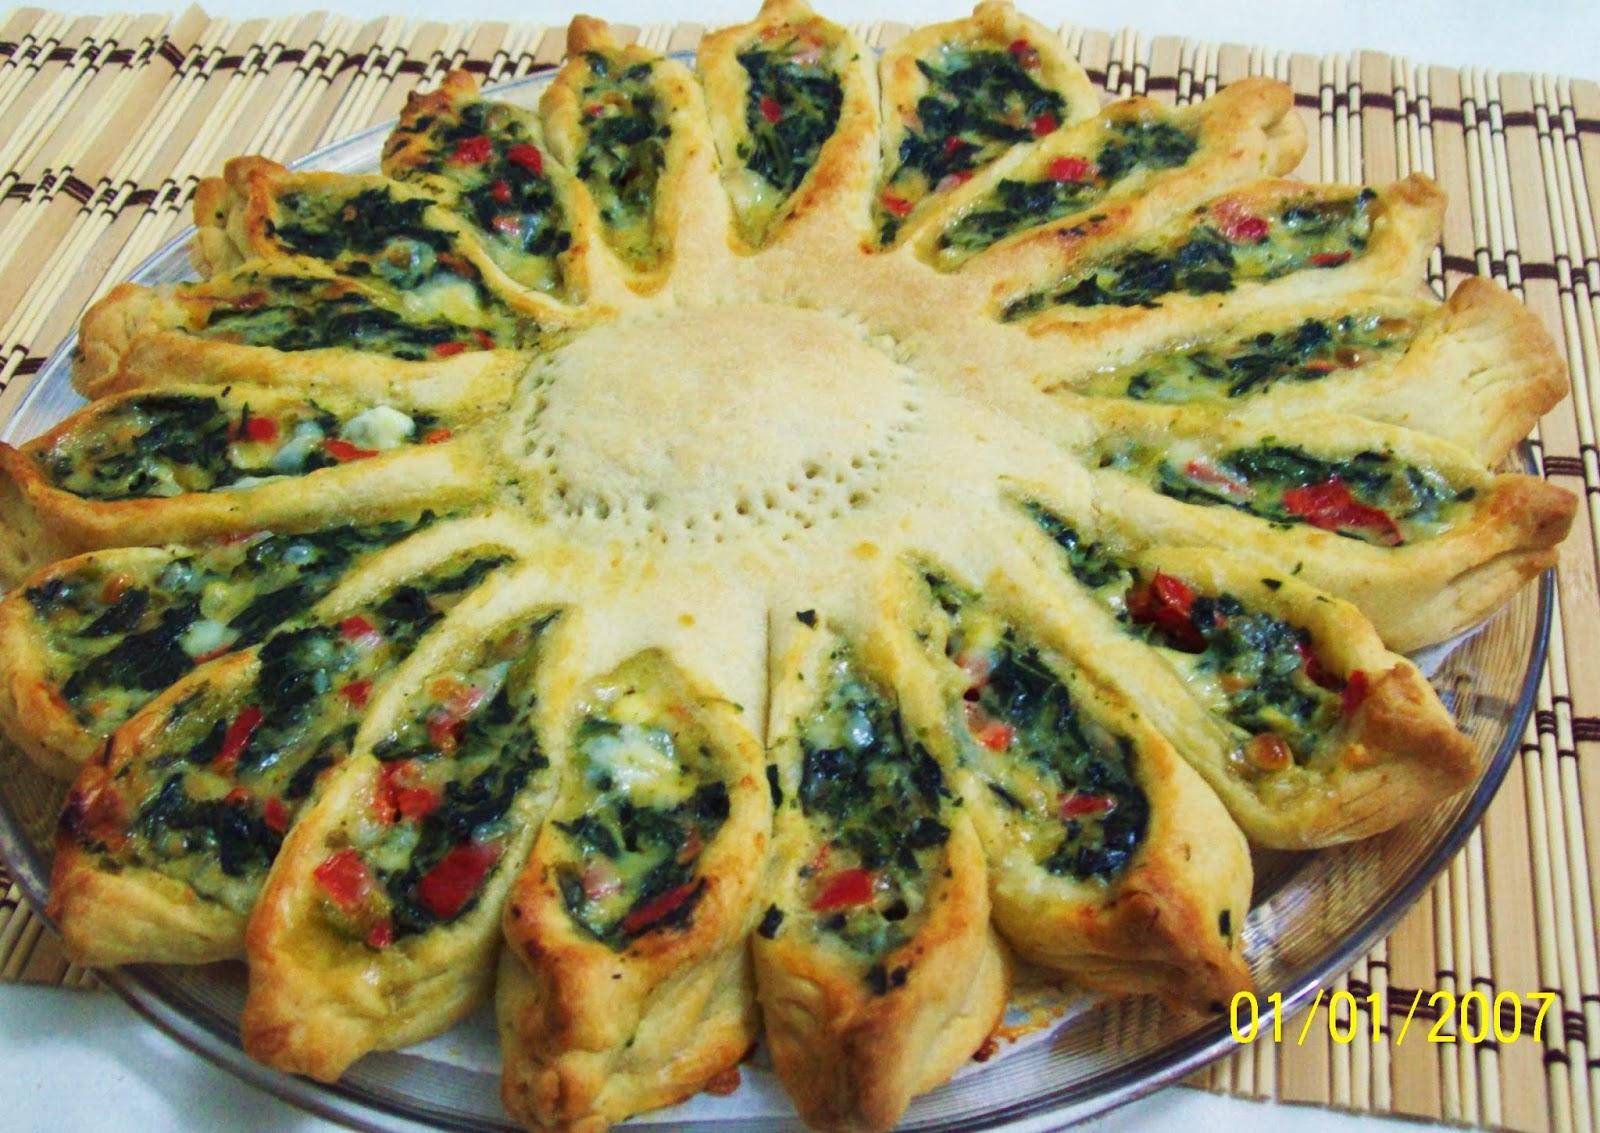 Peynirli Ispanaklı Kiş Tarifi